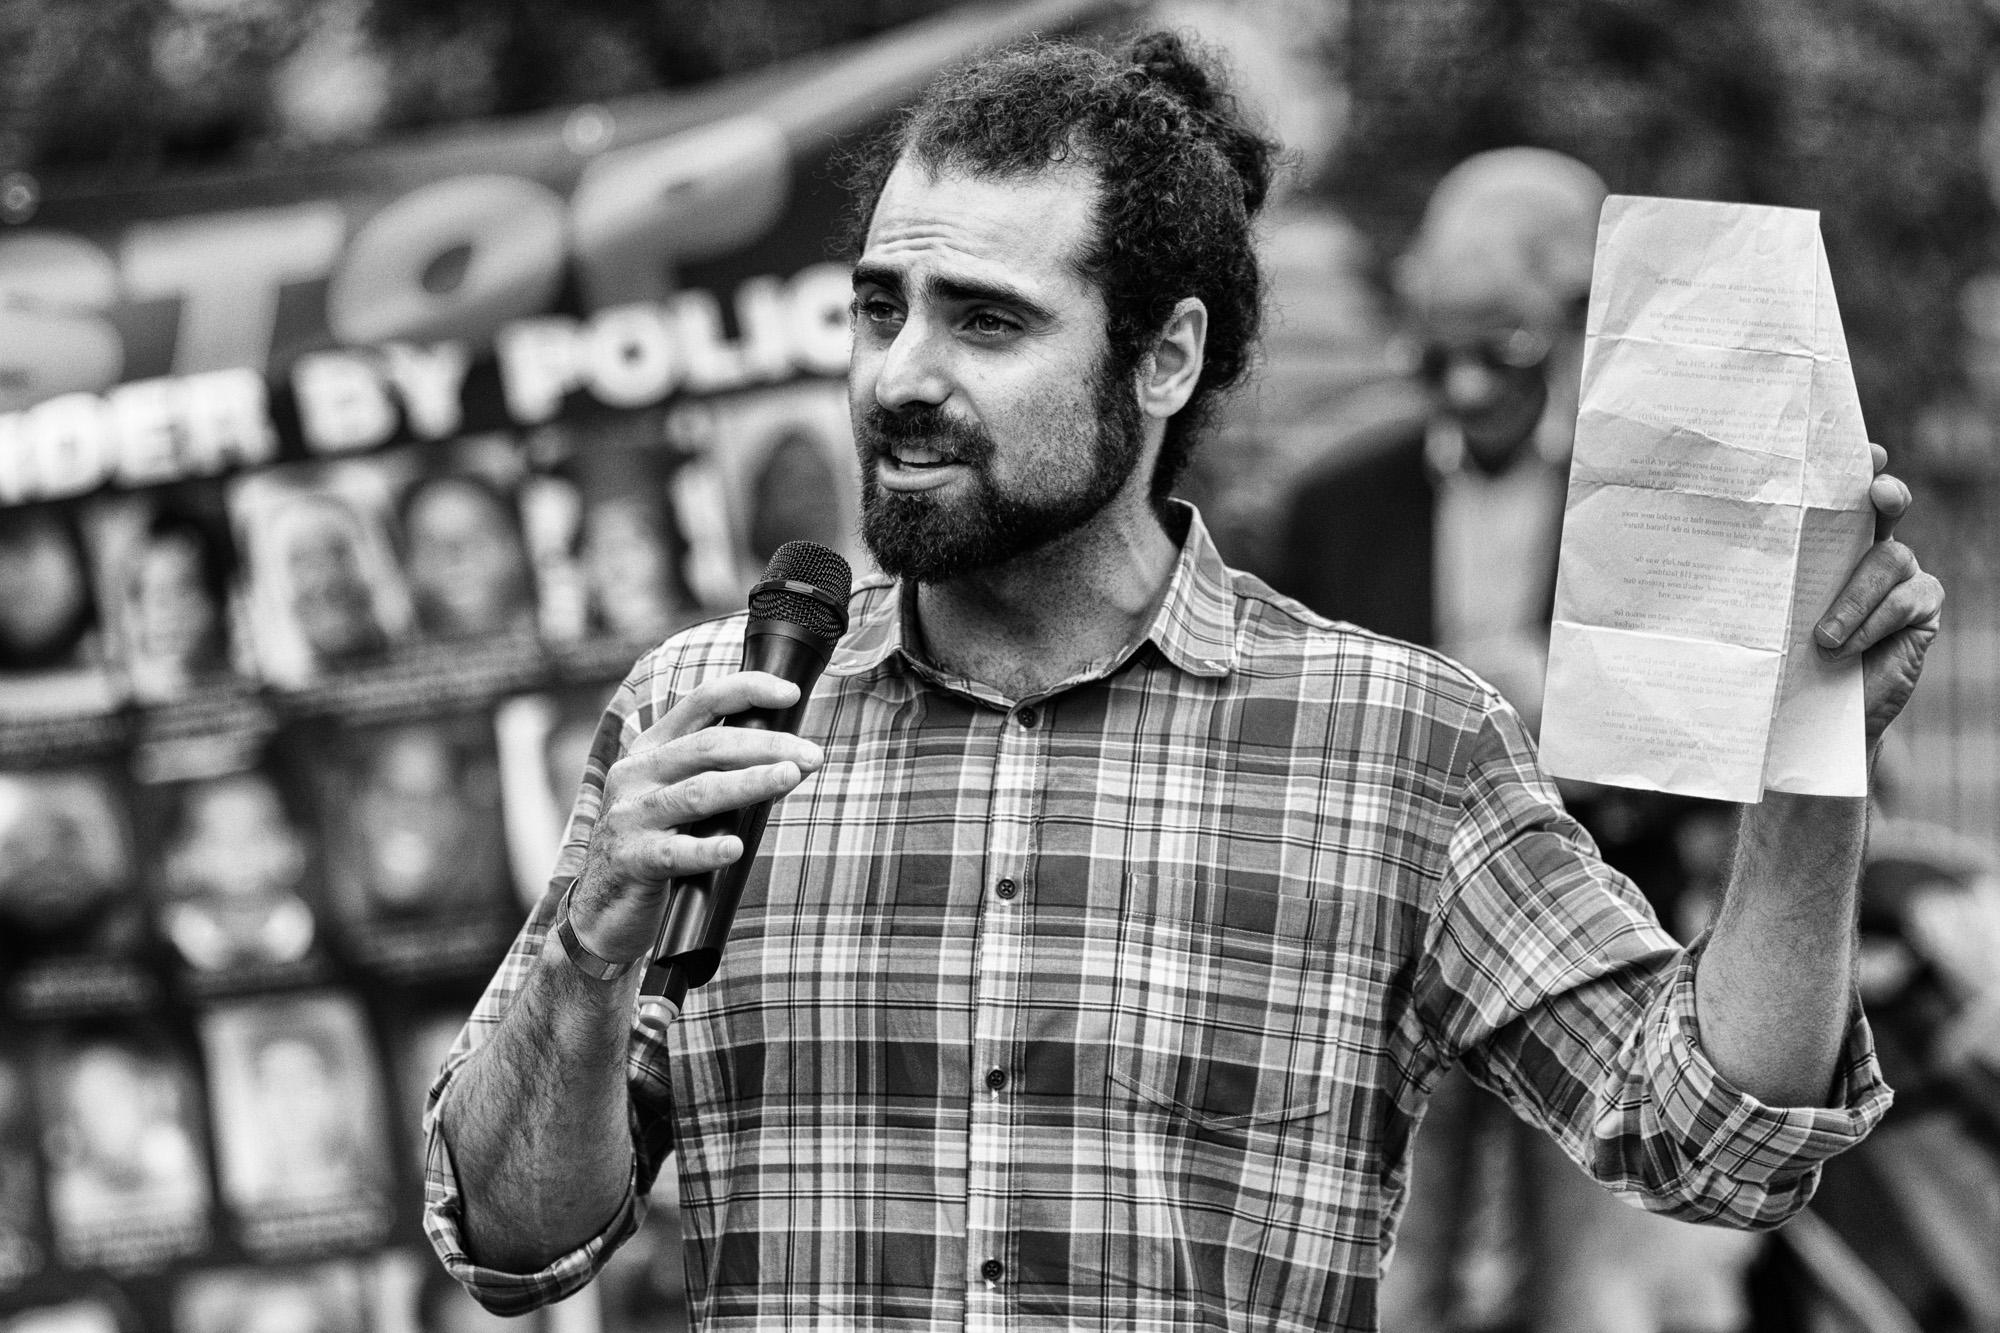 Cambridge City Council member Nadeem Mazen